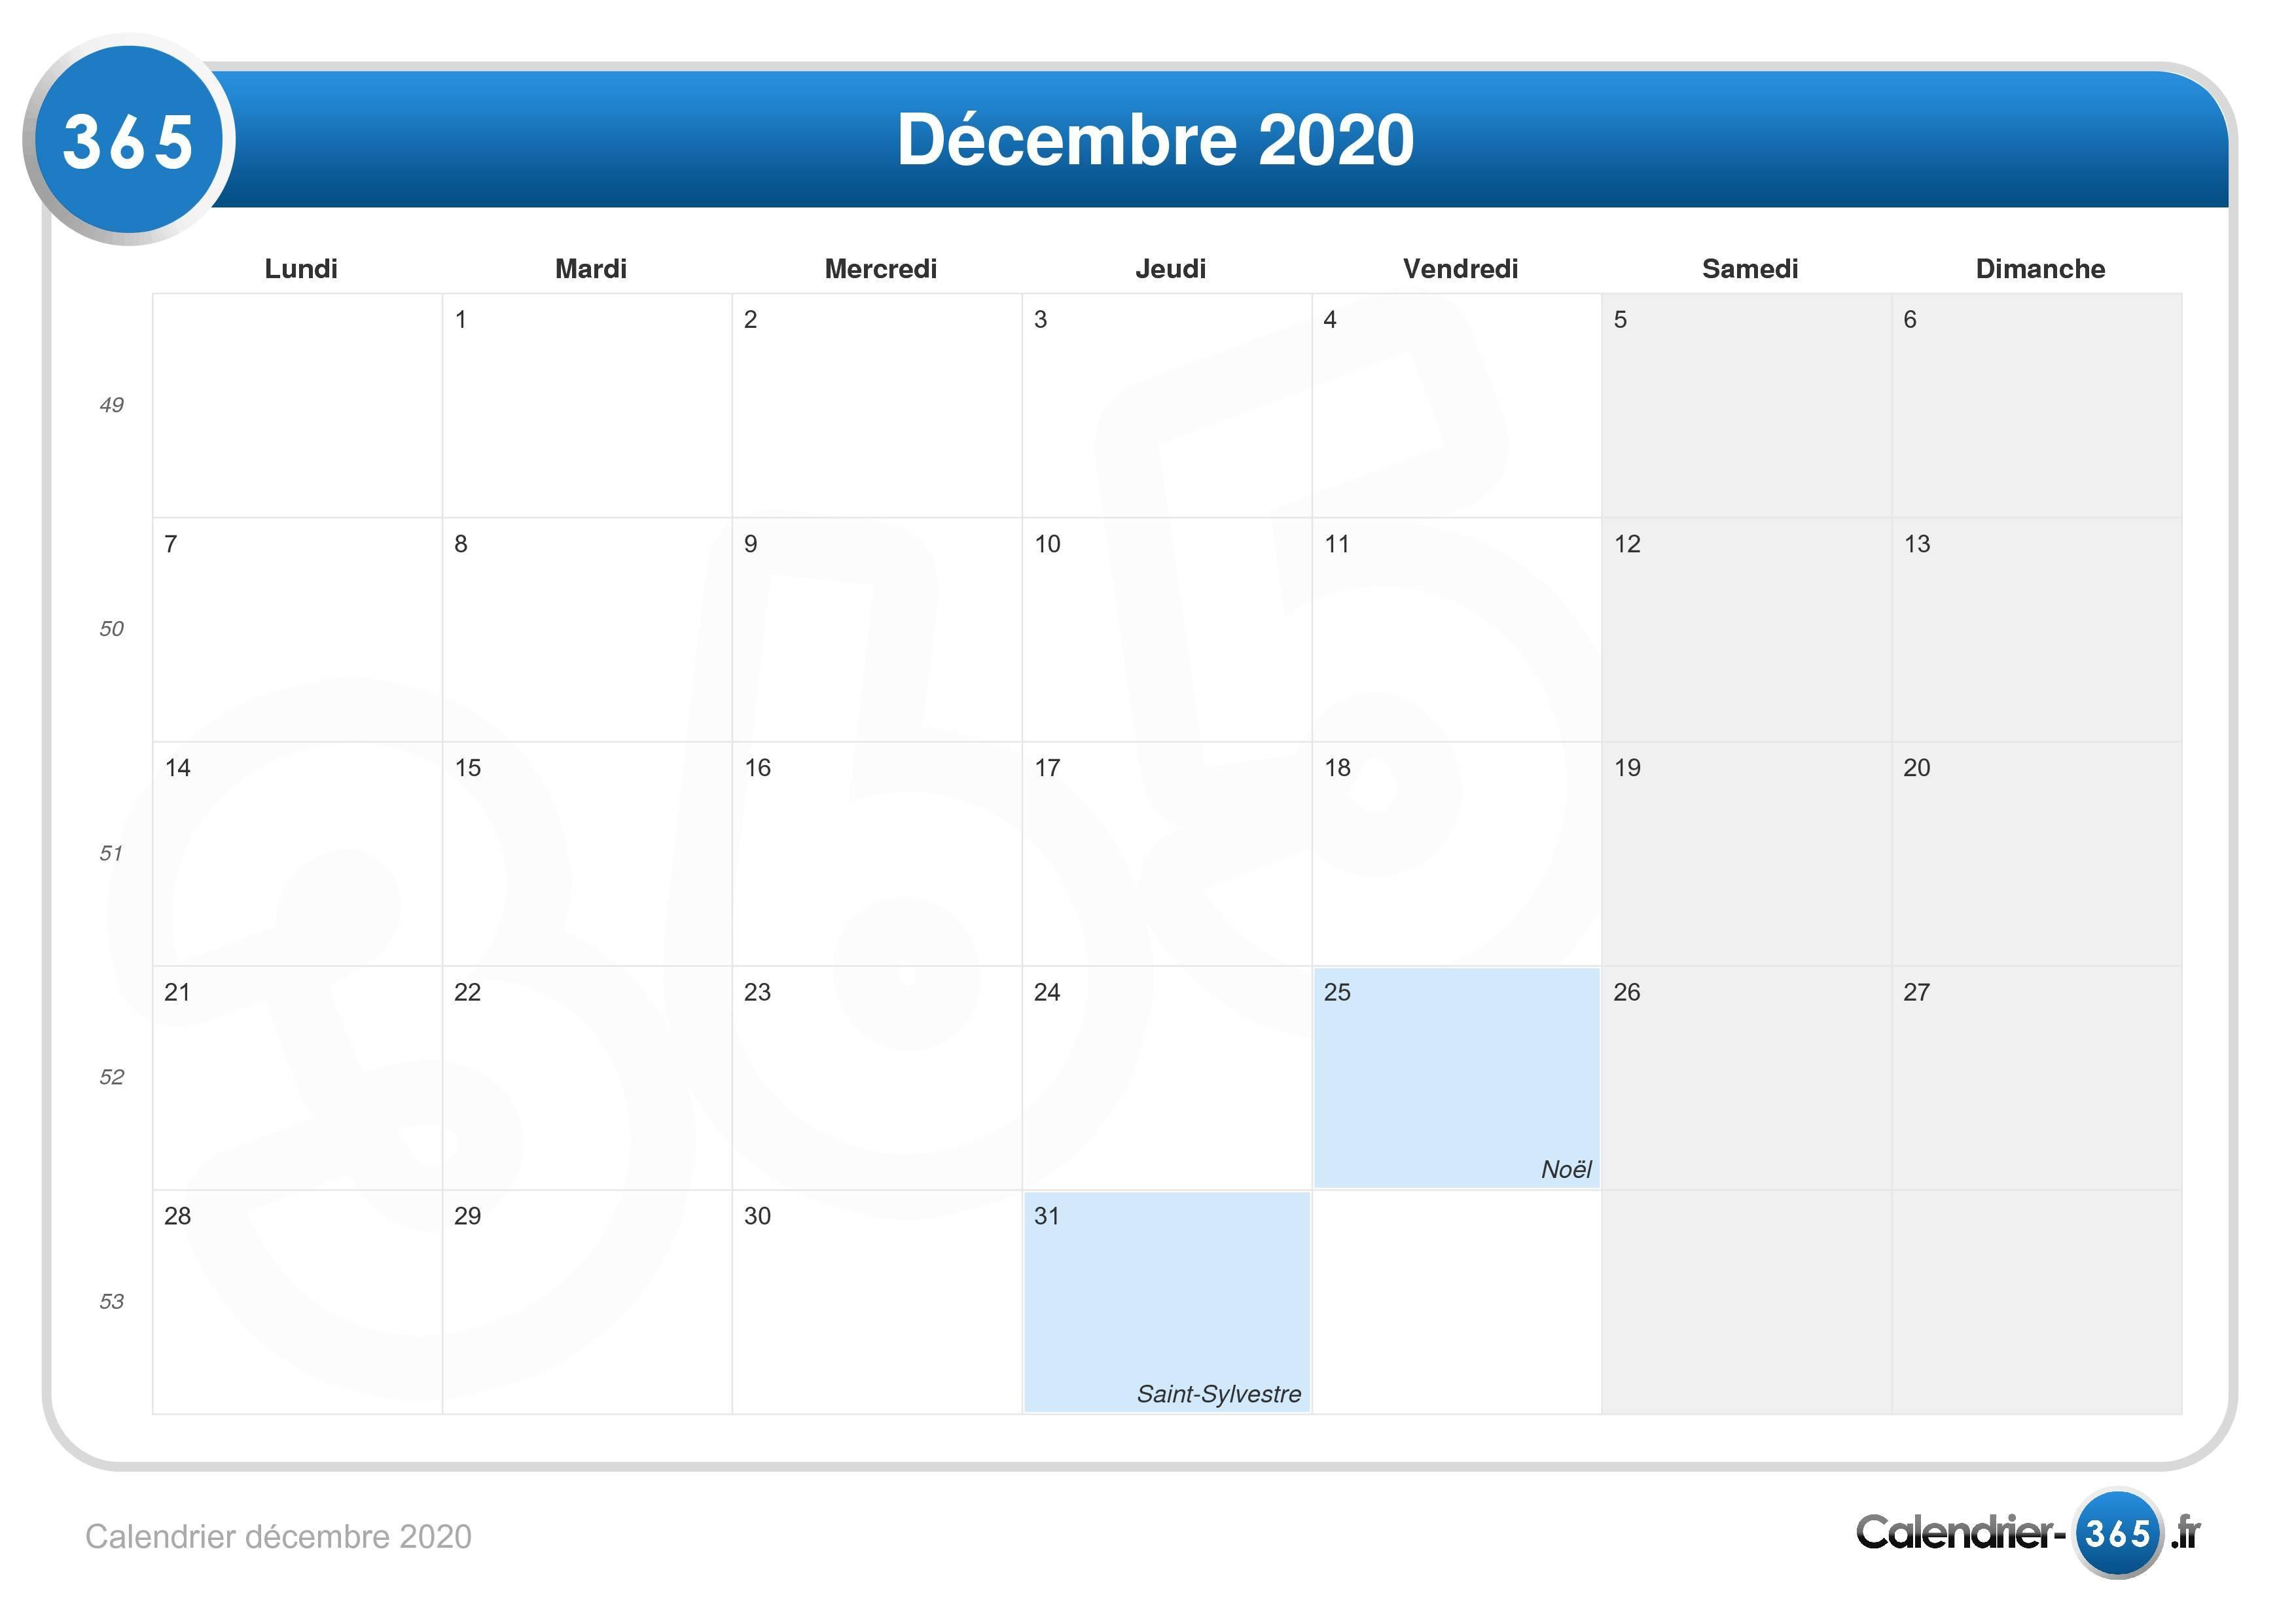 Calendrier De Decembre 2020.Calendrier Decembre 2020